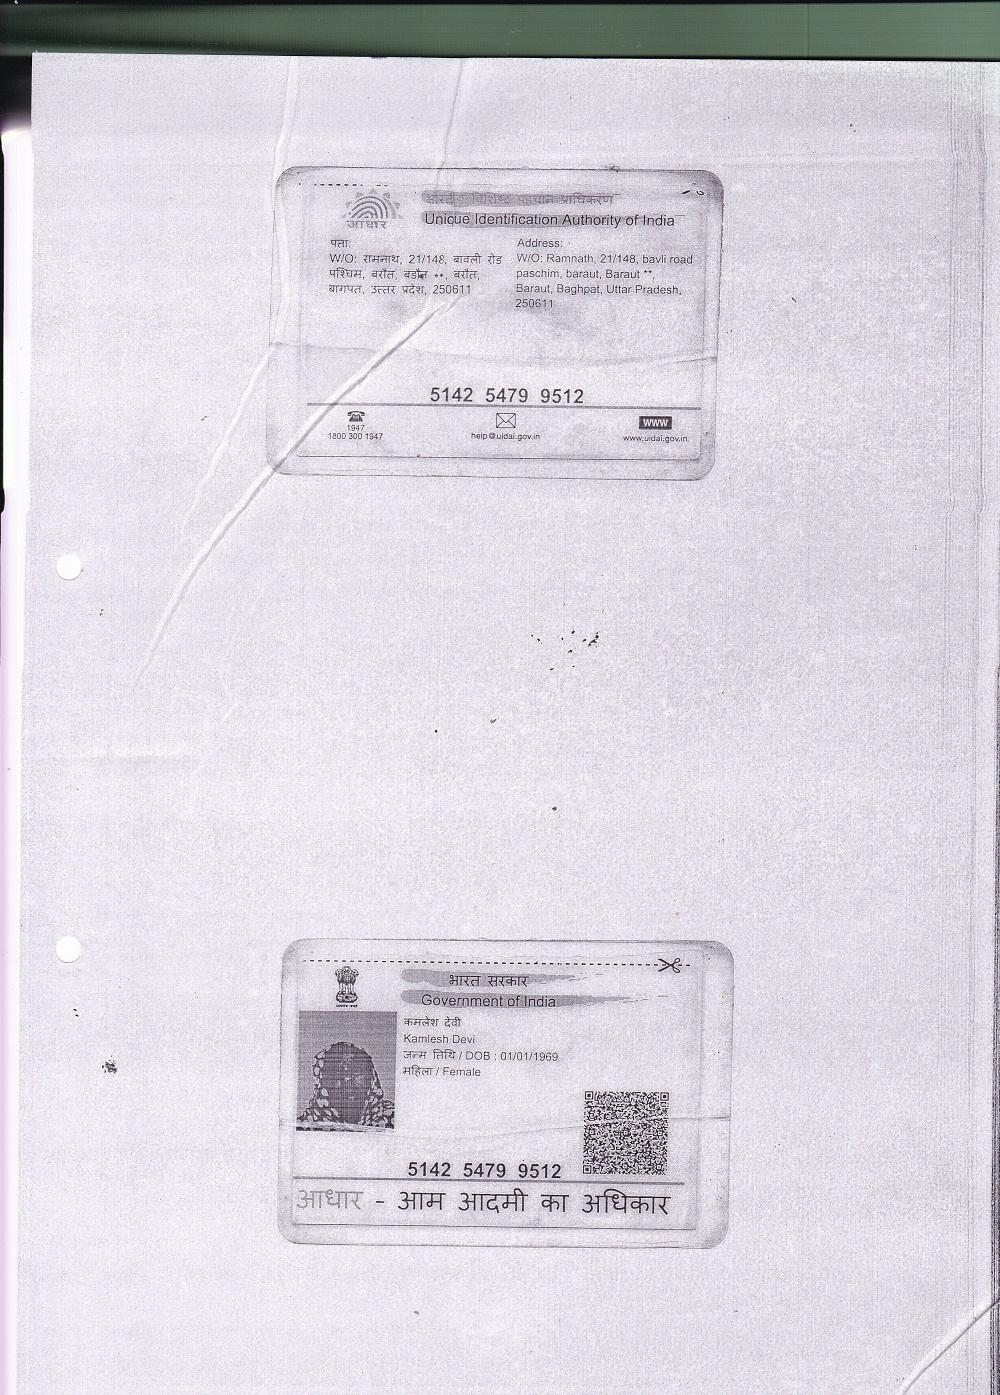 Kamlesh-Devi-49yrs-Acute-Leucoria -Body-Ache-treatment